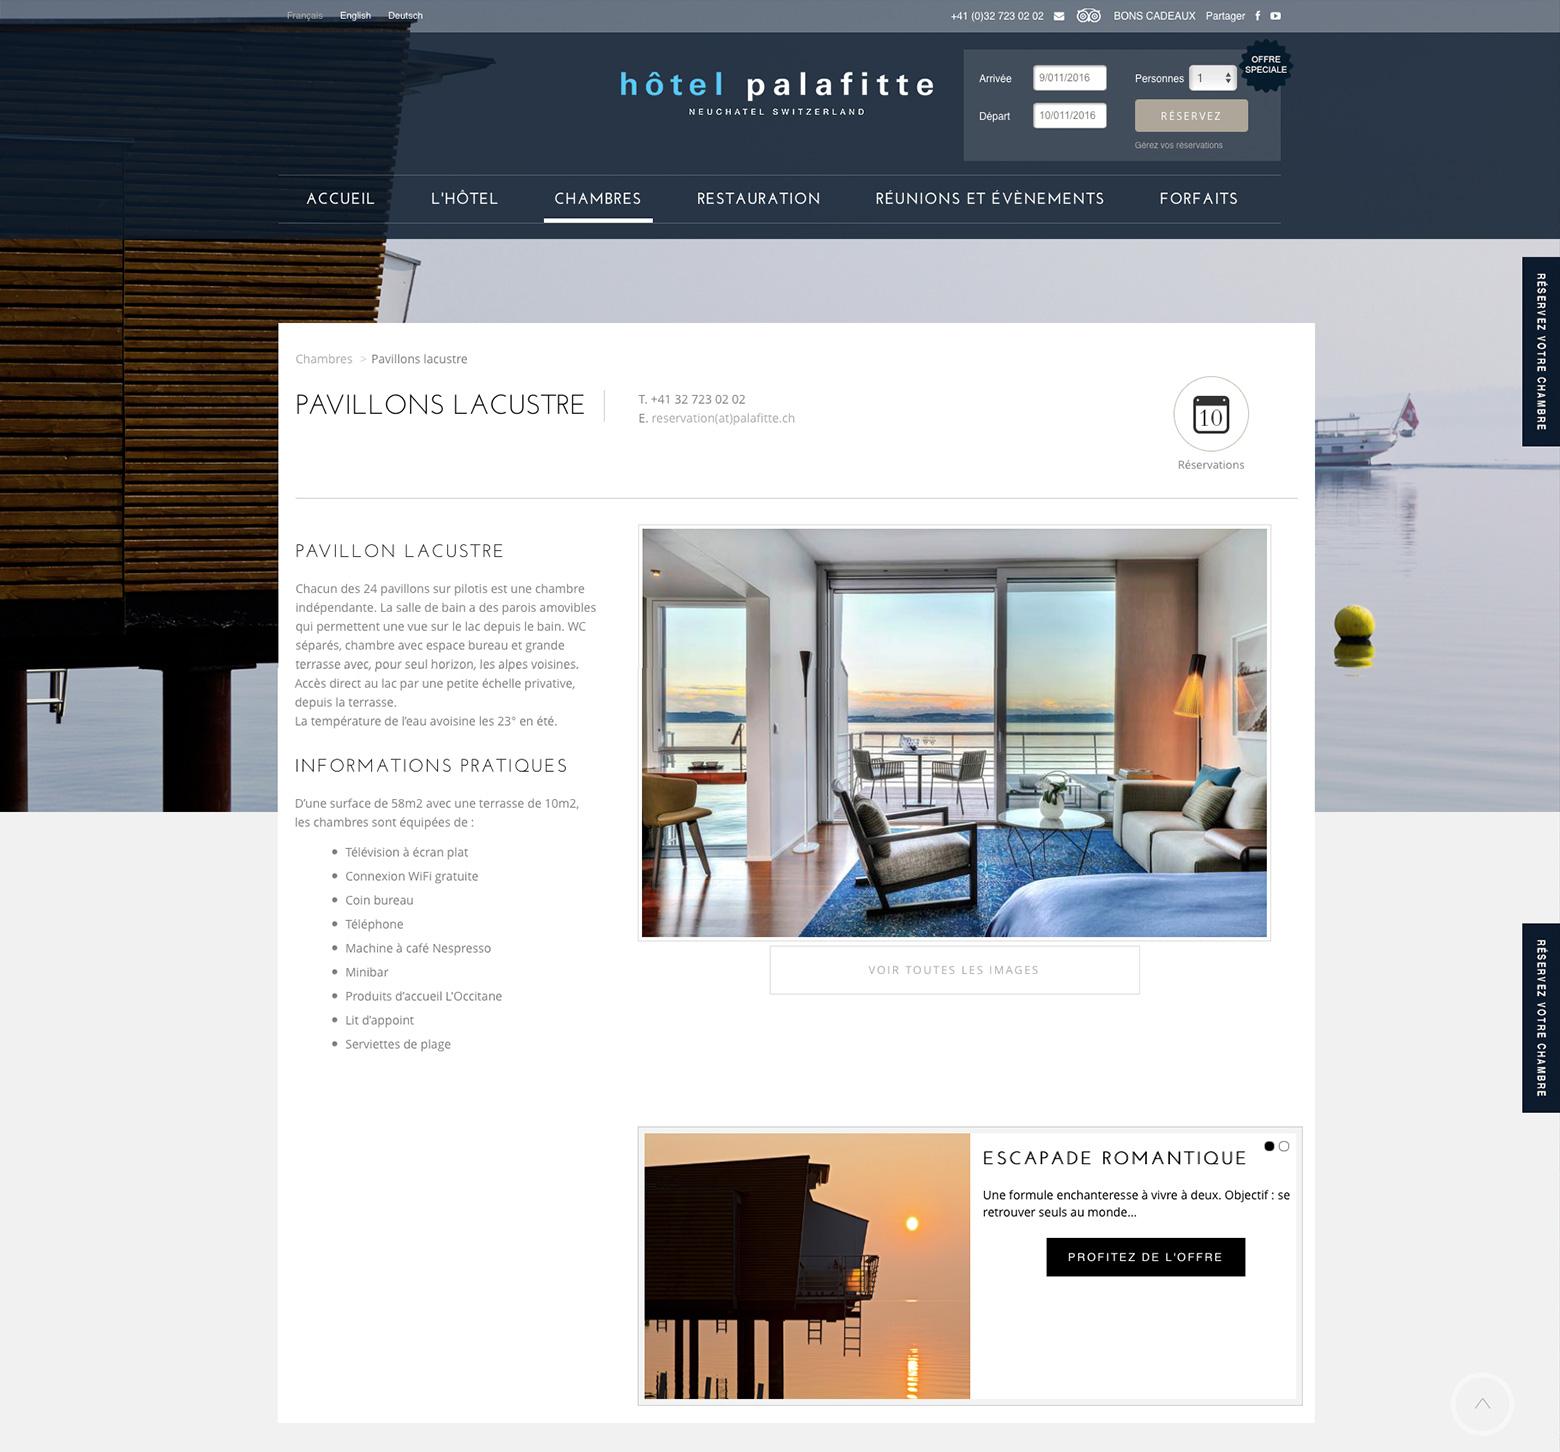 Hôtel Palafitte WNG Agence Digitale